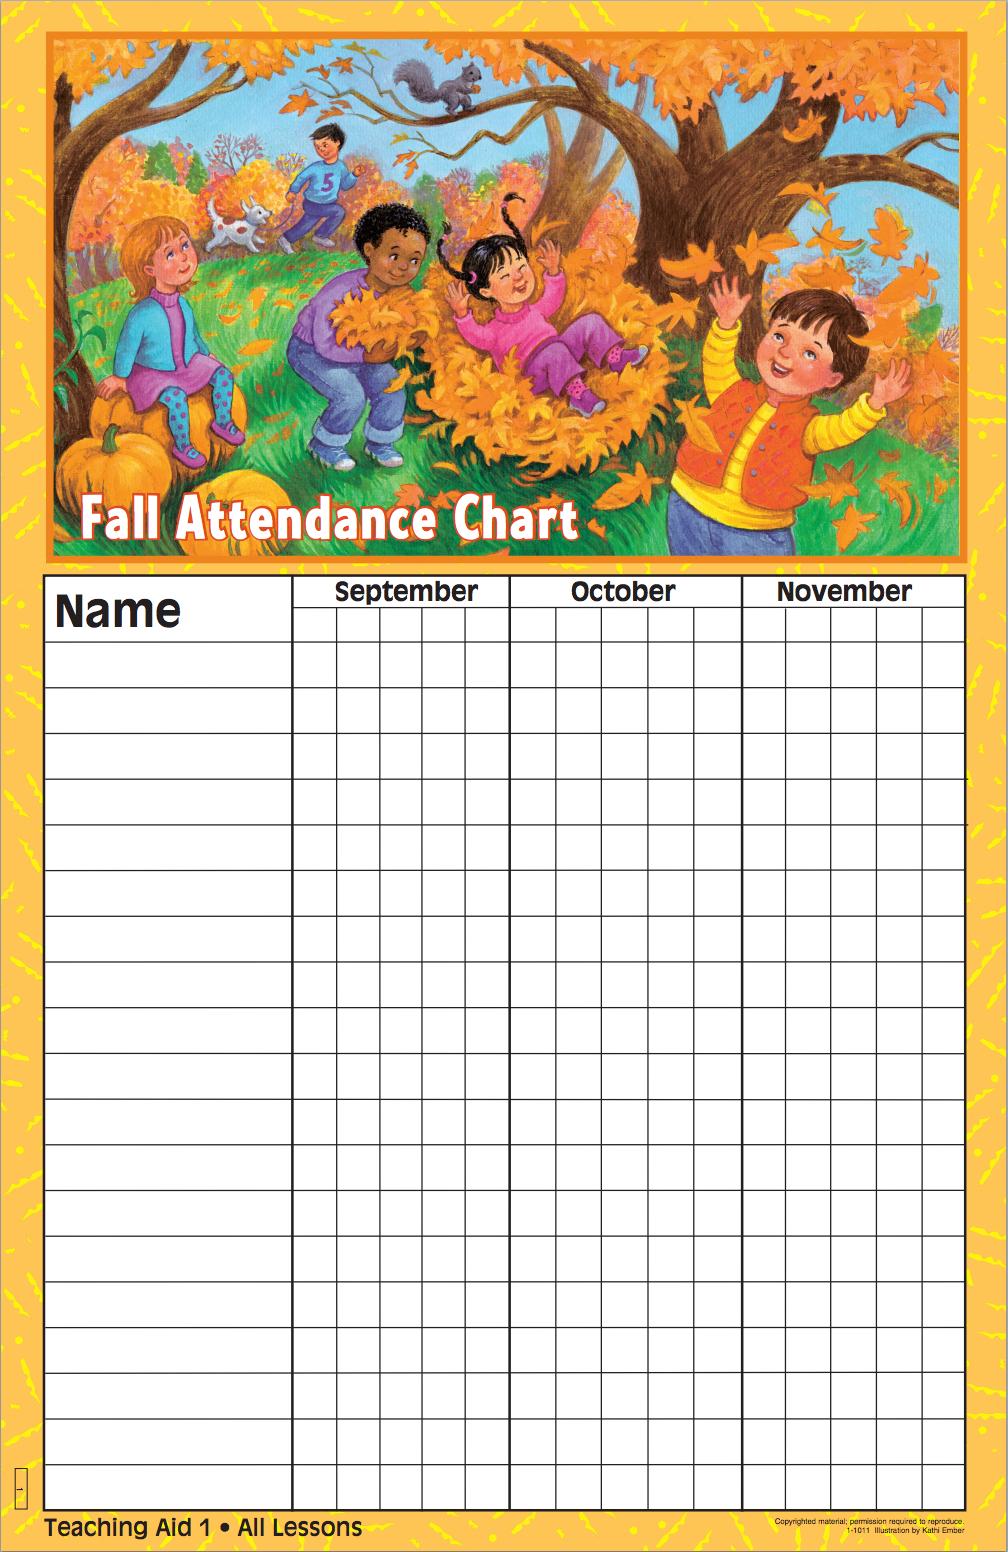 Pindonna Albertson On Children's Church | Attendance Chart - Sunday School Attendance Chart Free Printable